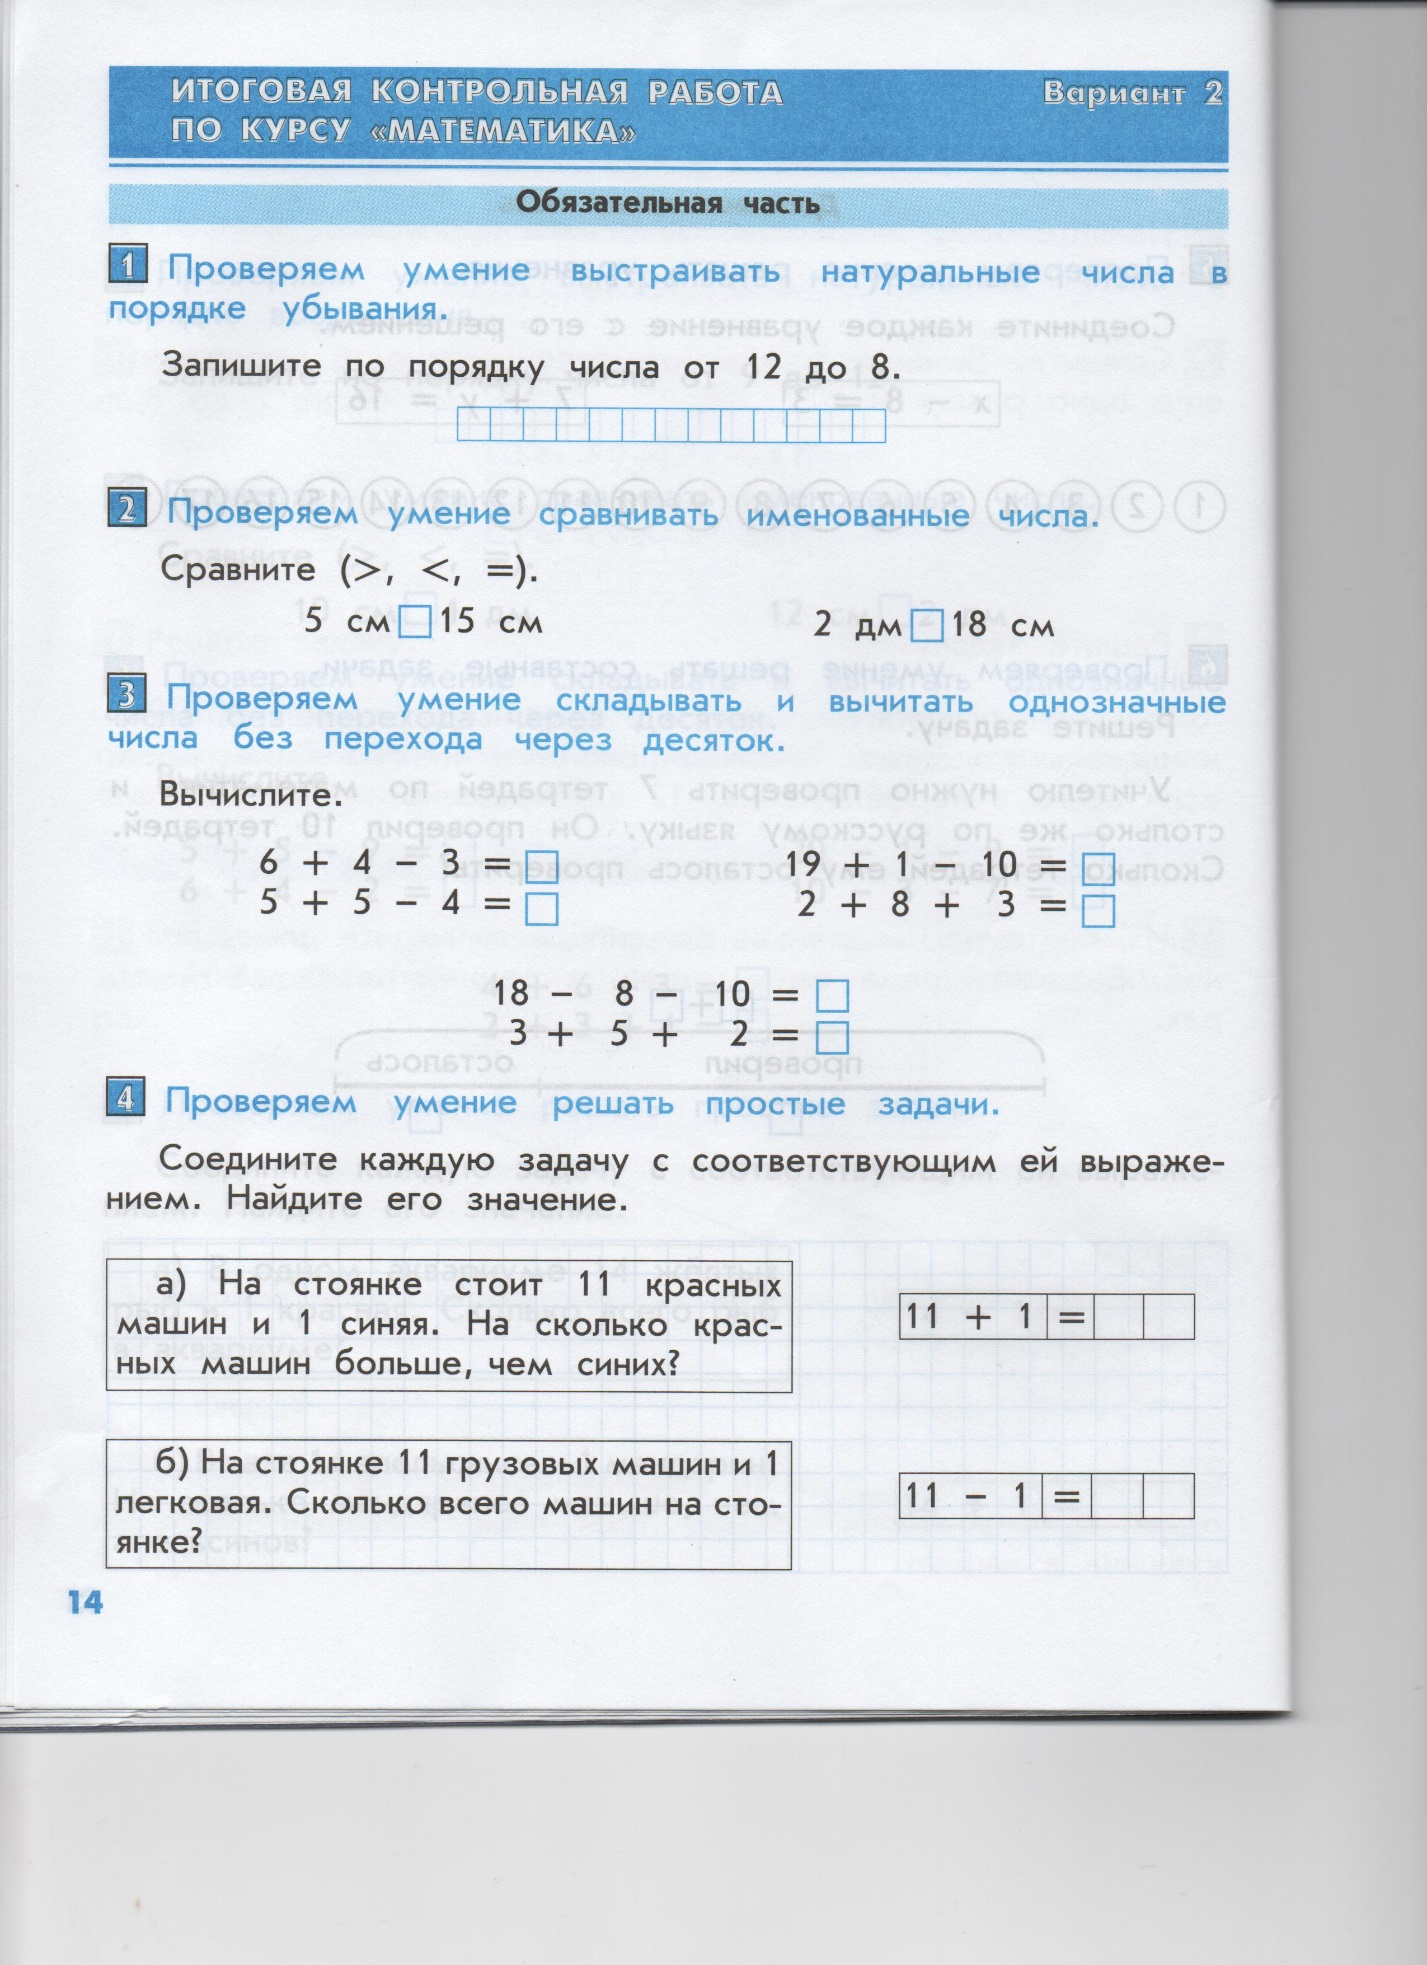 F:\Самост. по МАТЕМ. И окр.миру (СКАНЕР)\Математика\1 017.jpg